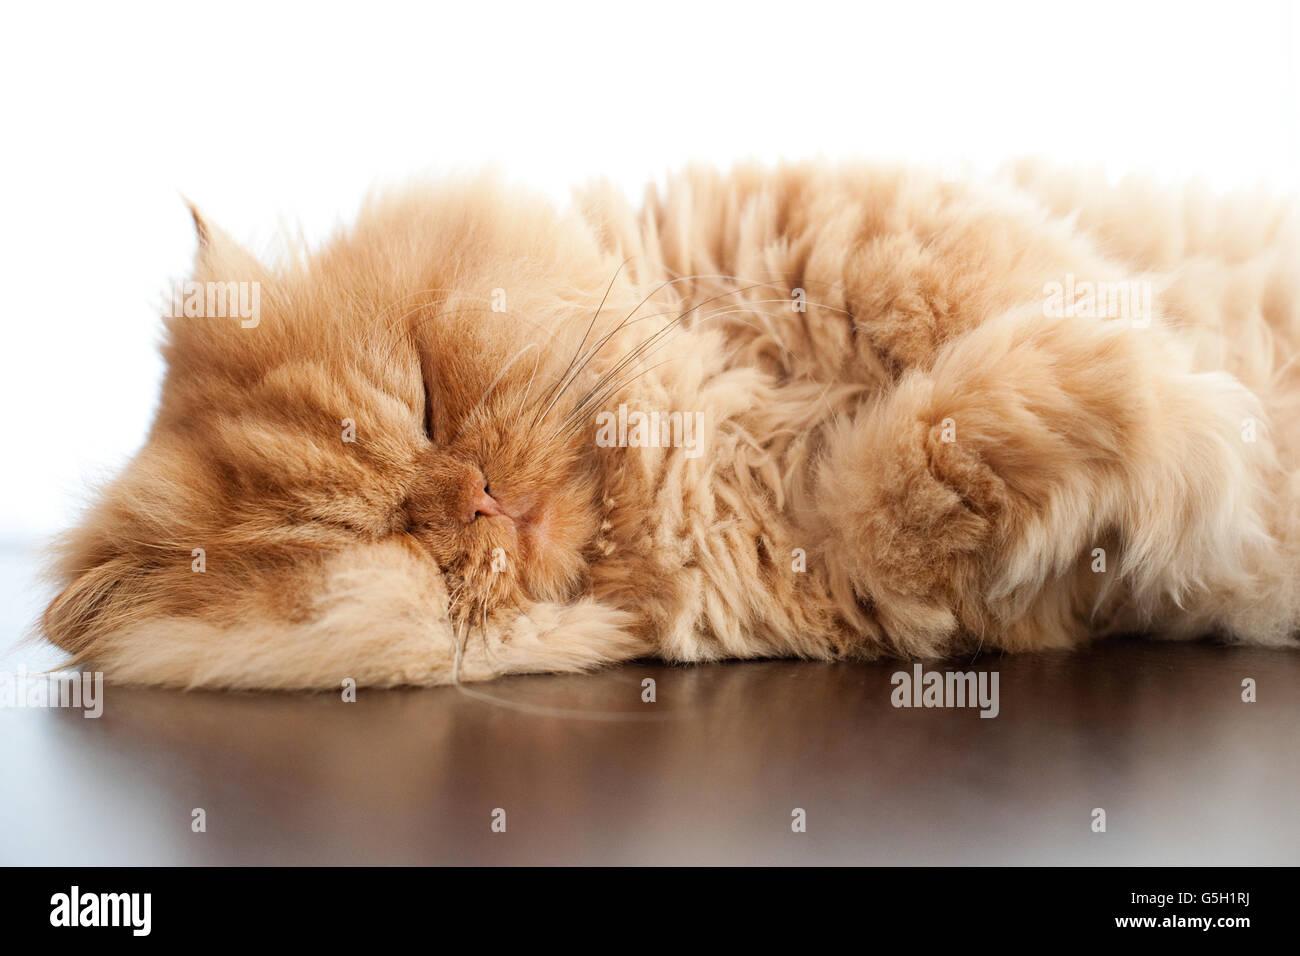 Persian cat sleeping on table - Stock Image